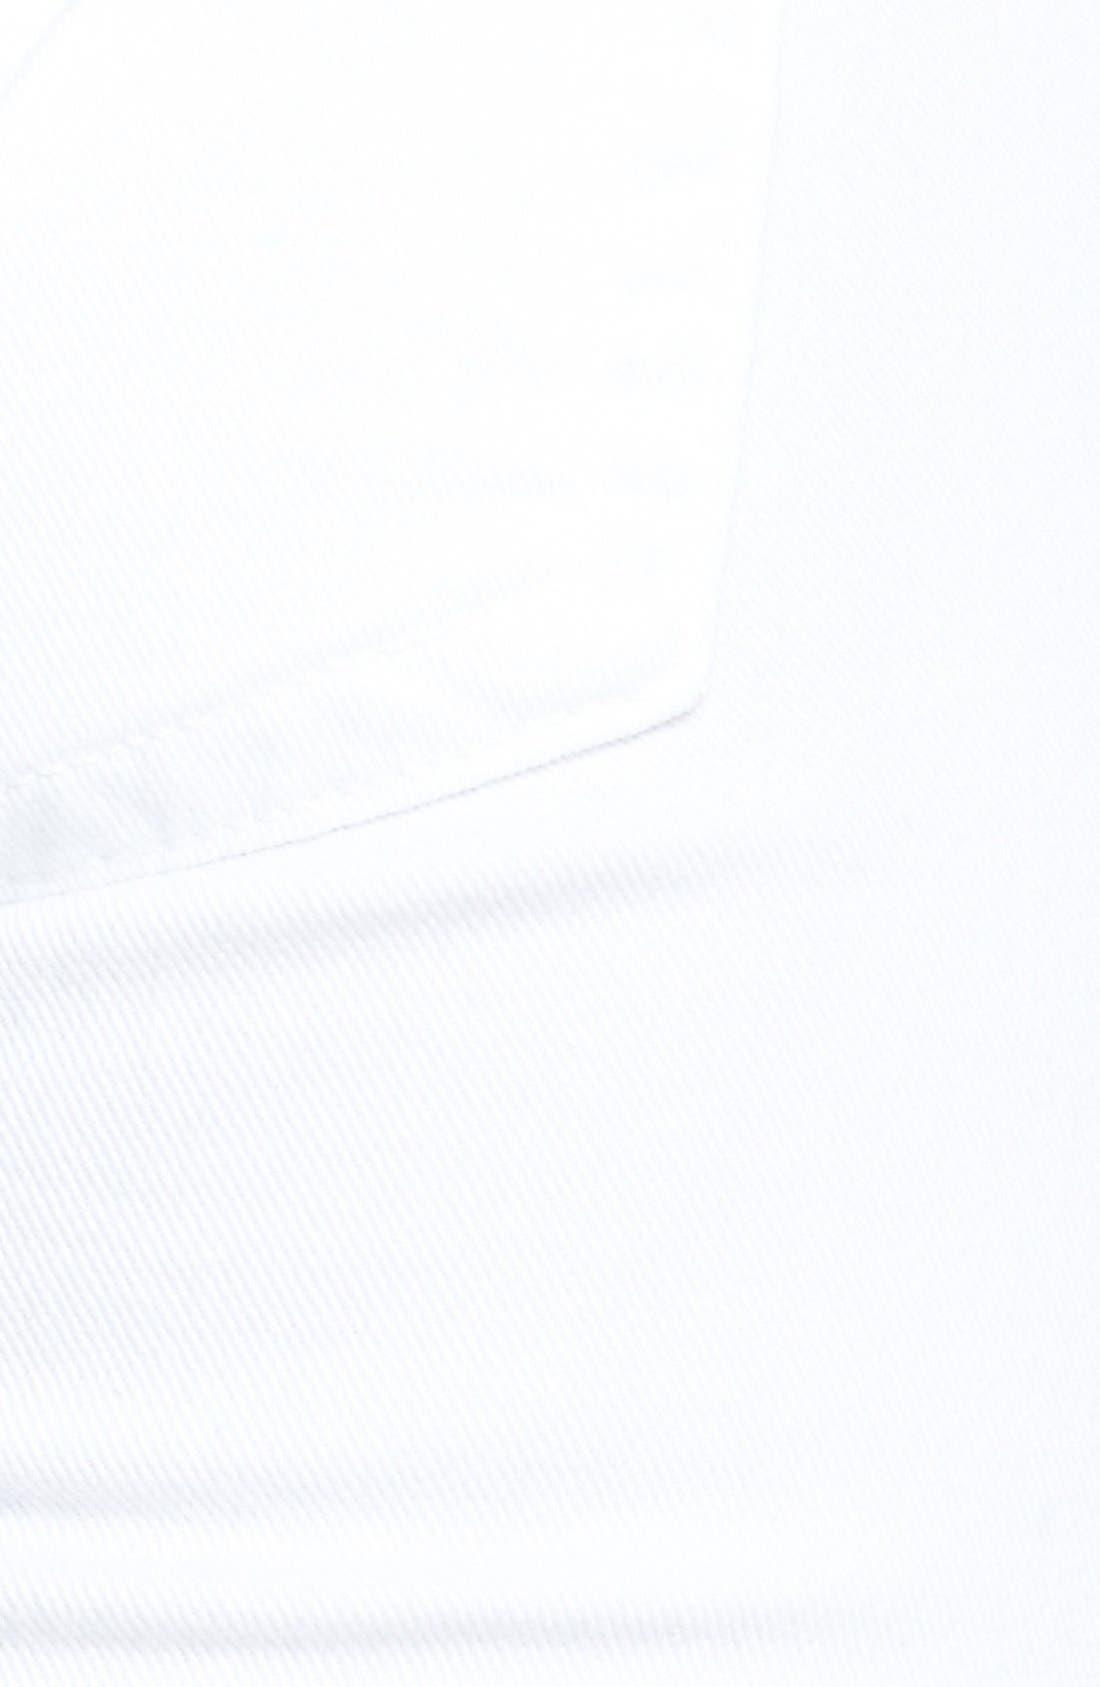 Alternate Image 3  - Hudson Jeans Signature Flap Pocket Bootcut Stretch Jeans (White)